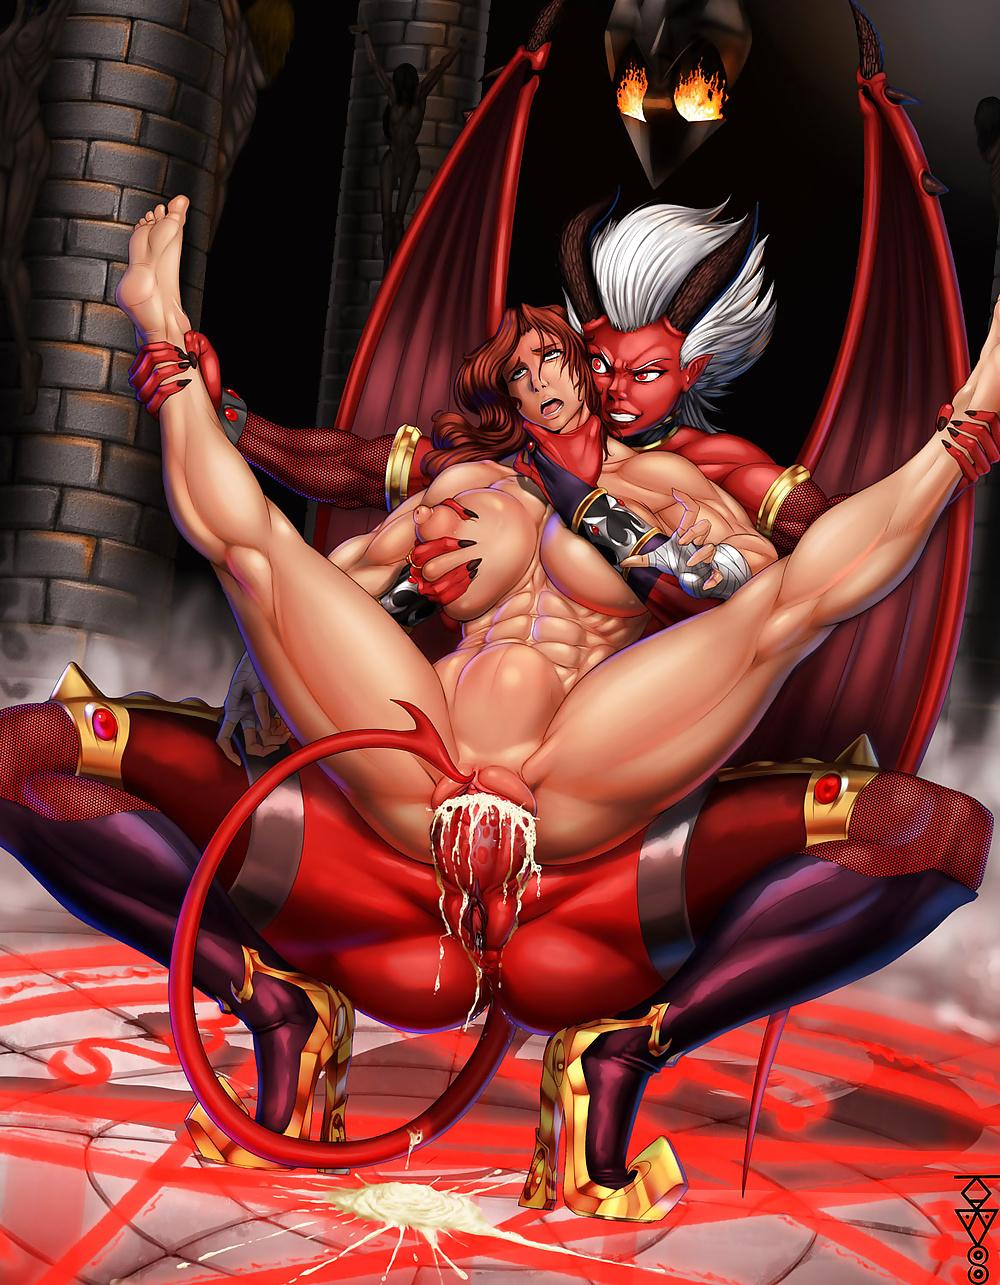 Demon Girl Sex